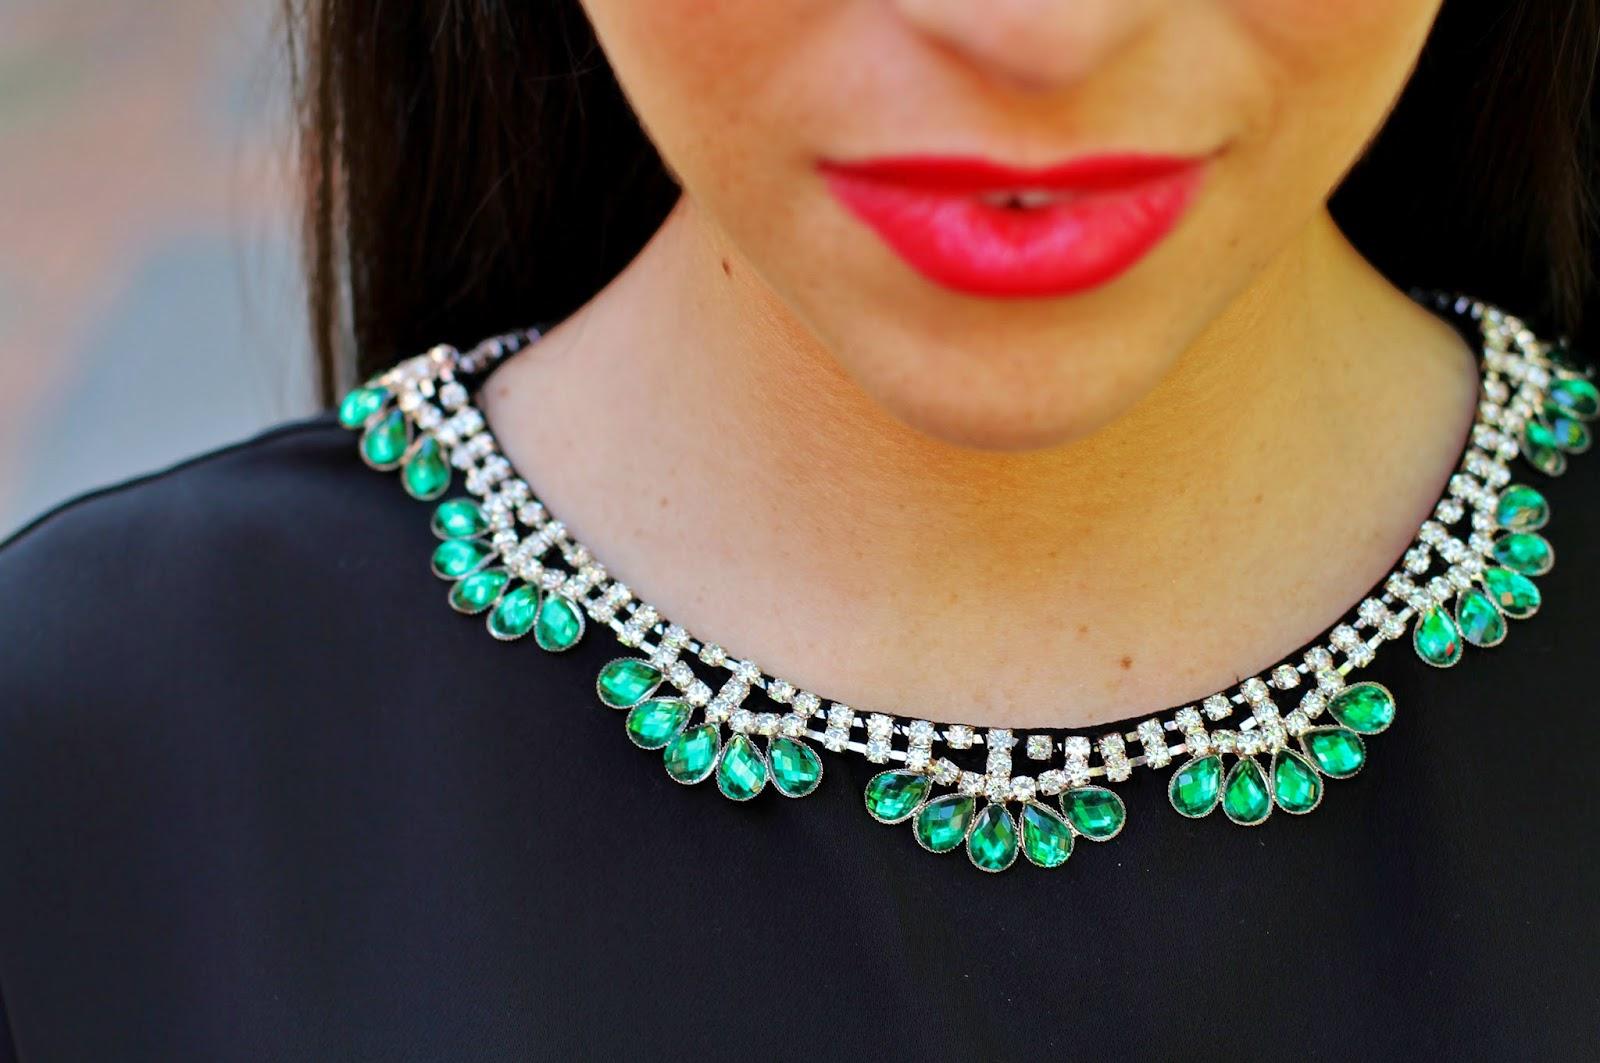 crystals_emerald_paillettes_zara_shirt_2012